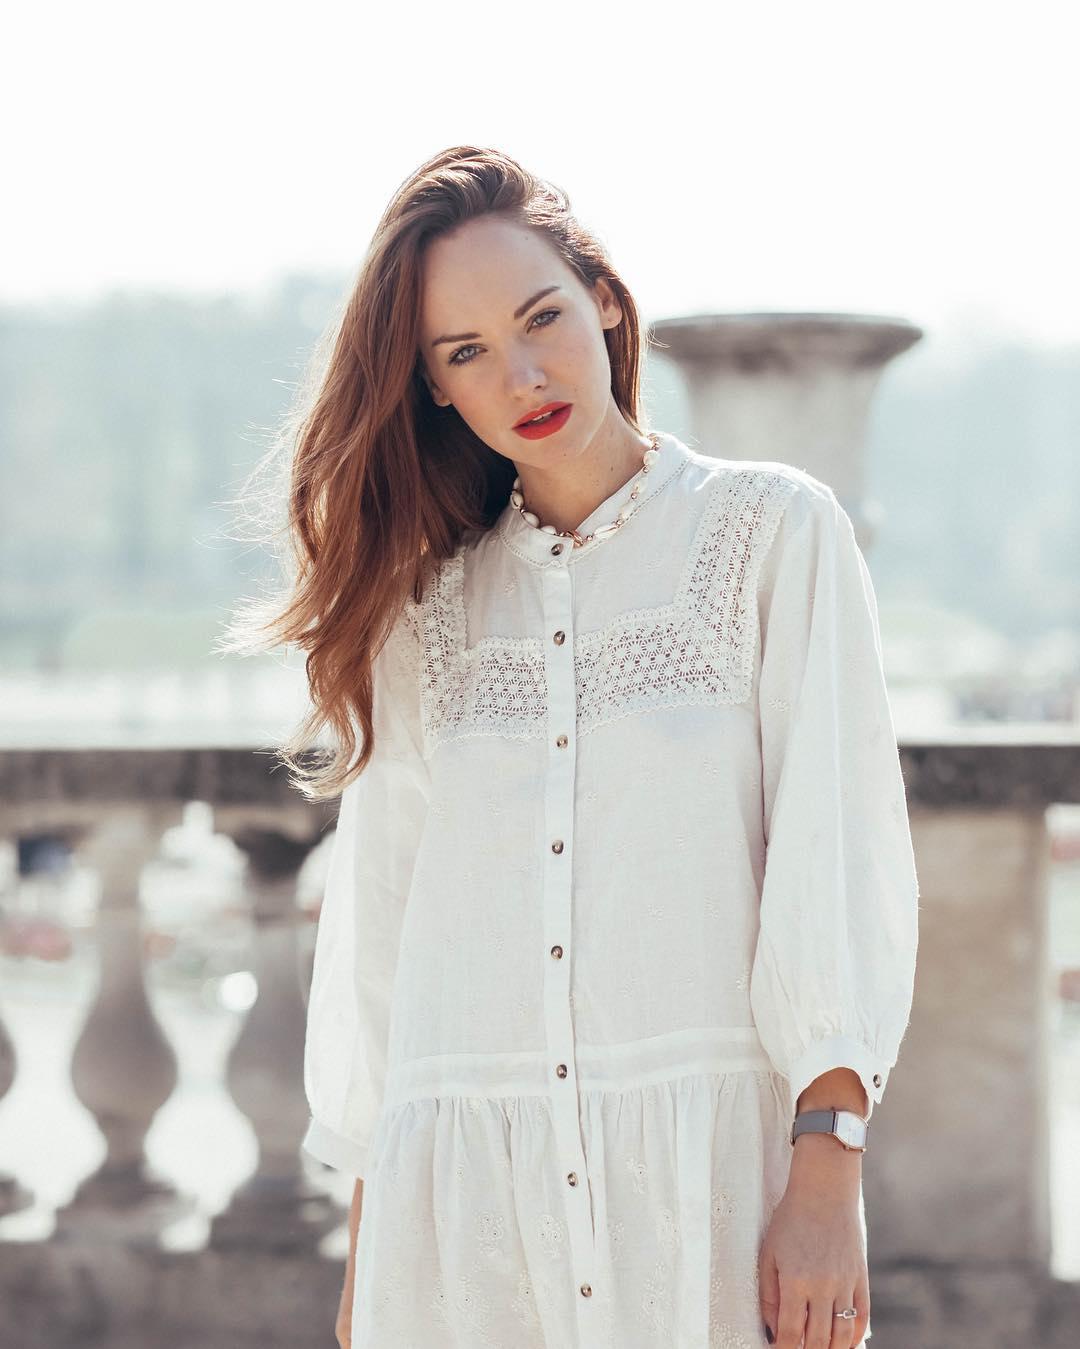 embroidered lace dress de Zara sur opheduvillard